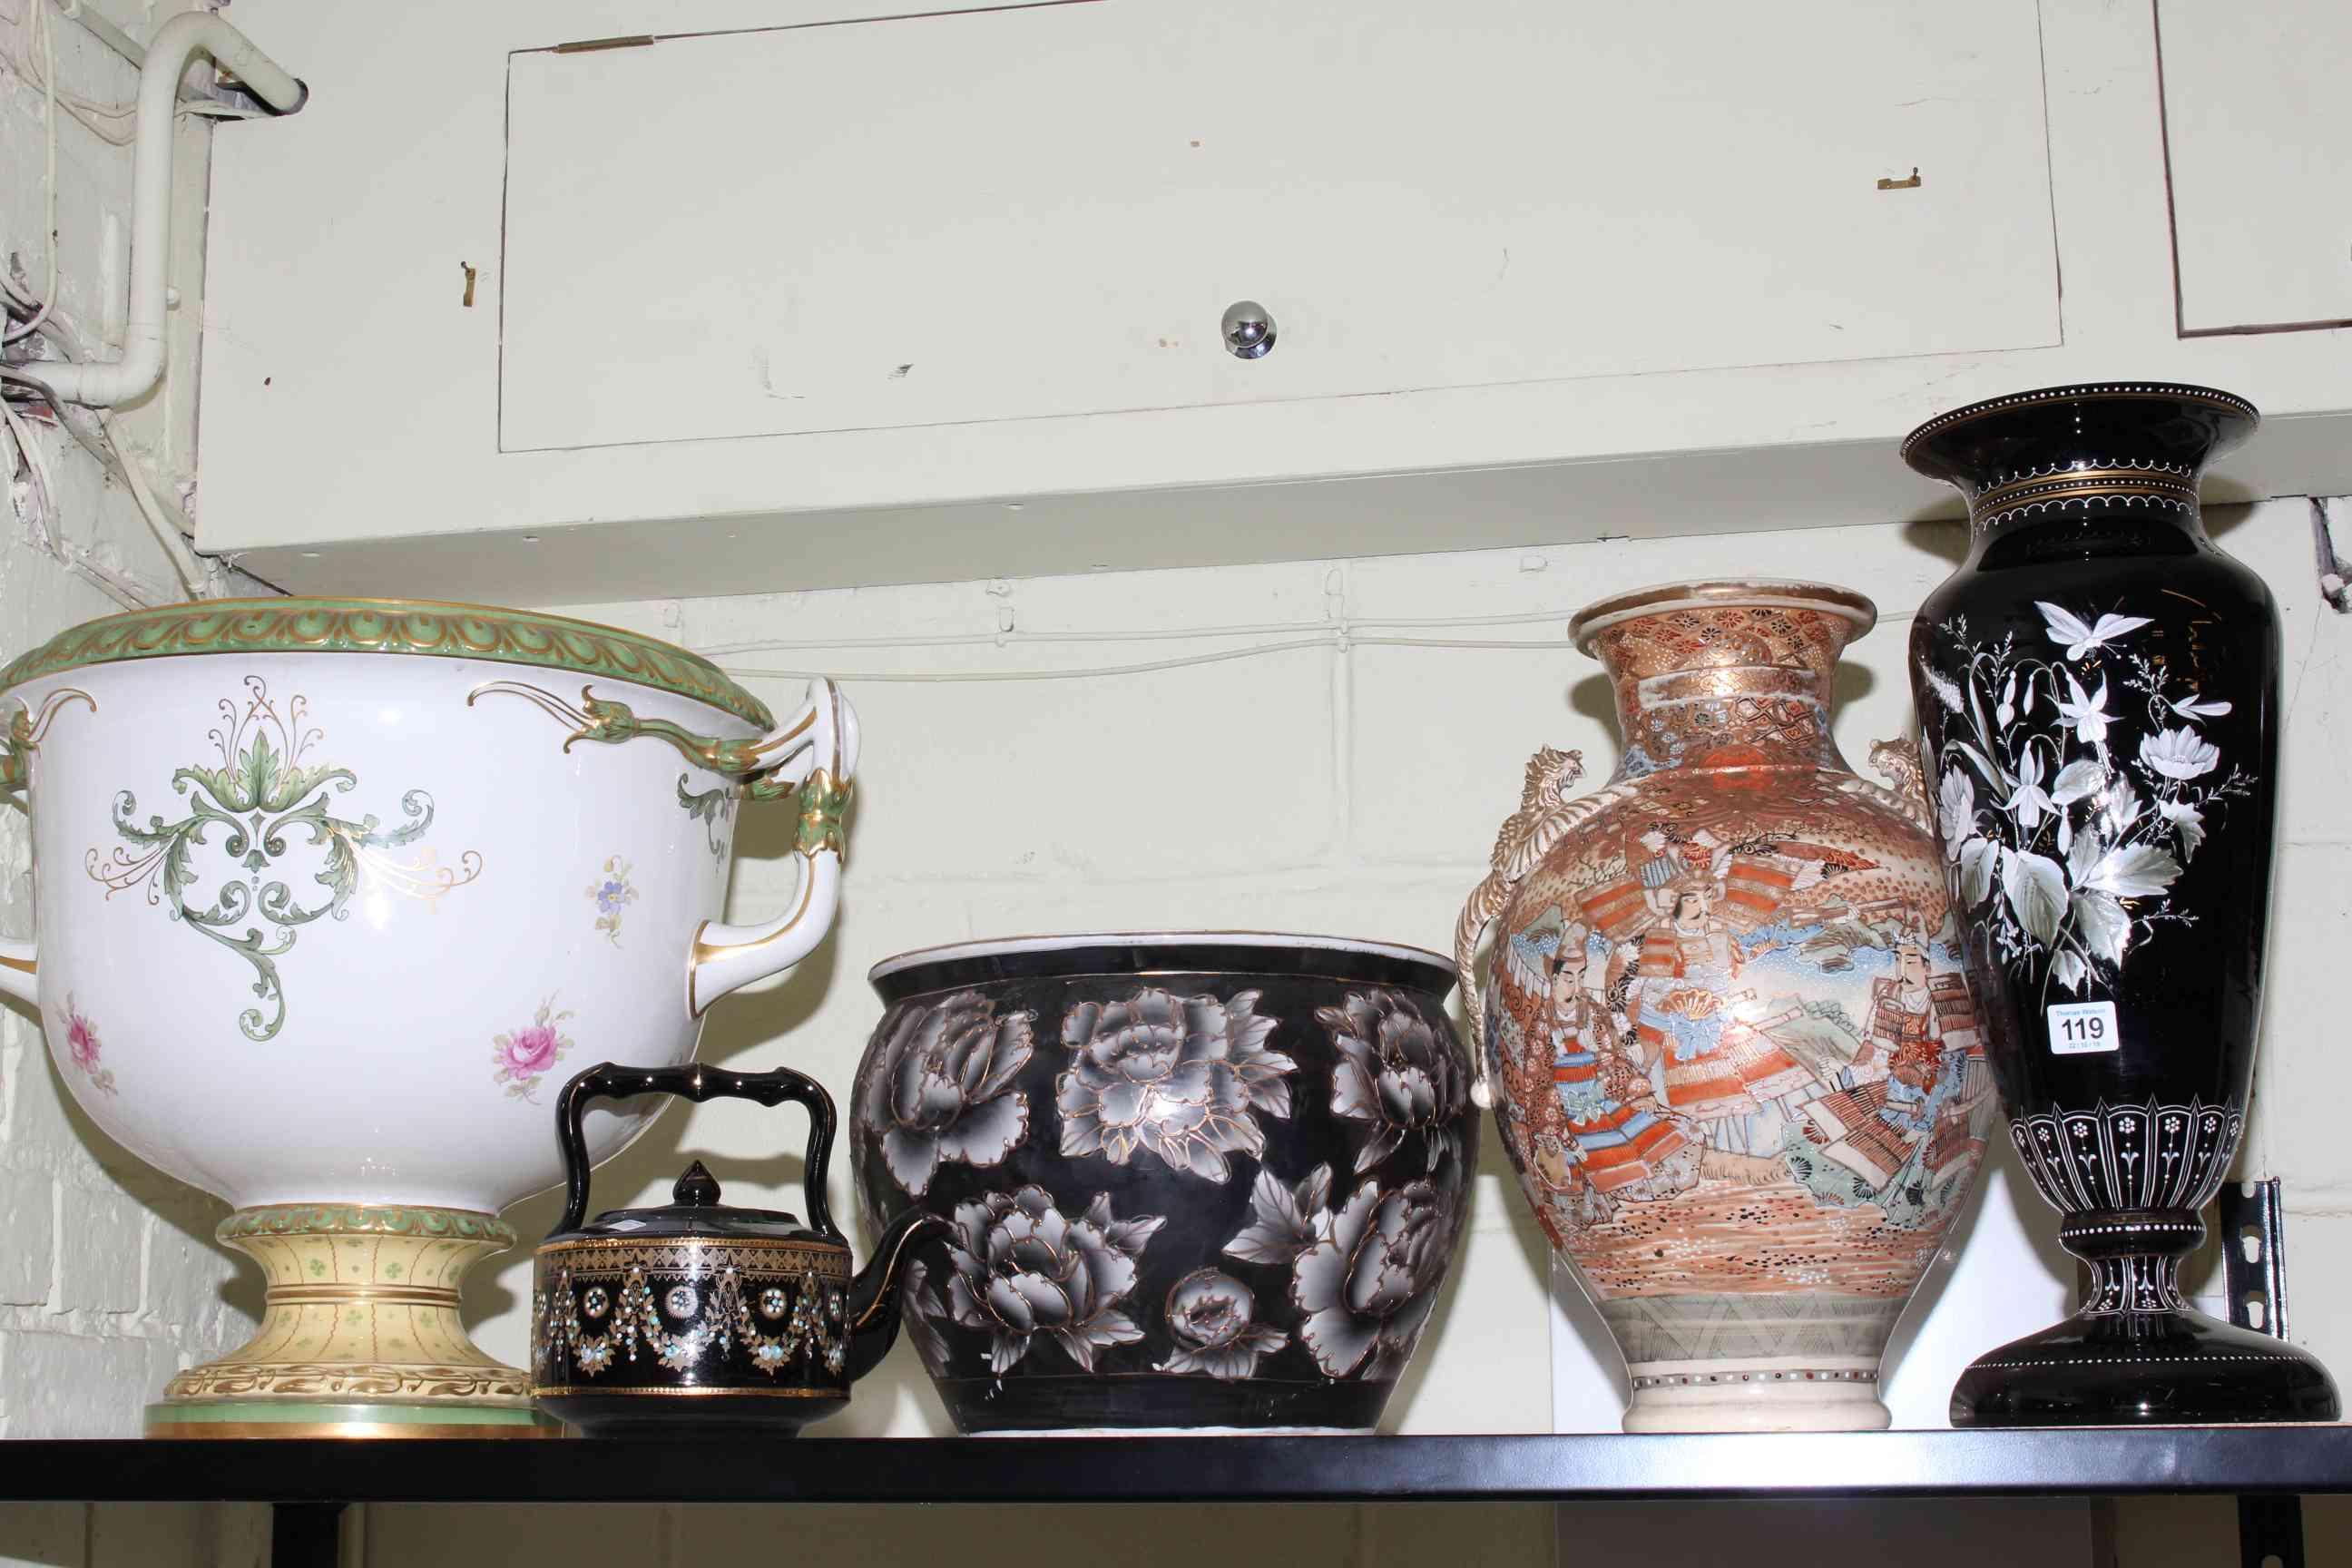 Lot 119 - Satsuma vase, large china urn, jardiniere, floral glass vase and teapot.